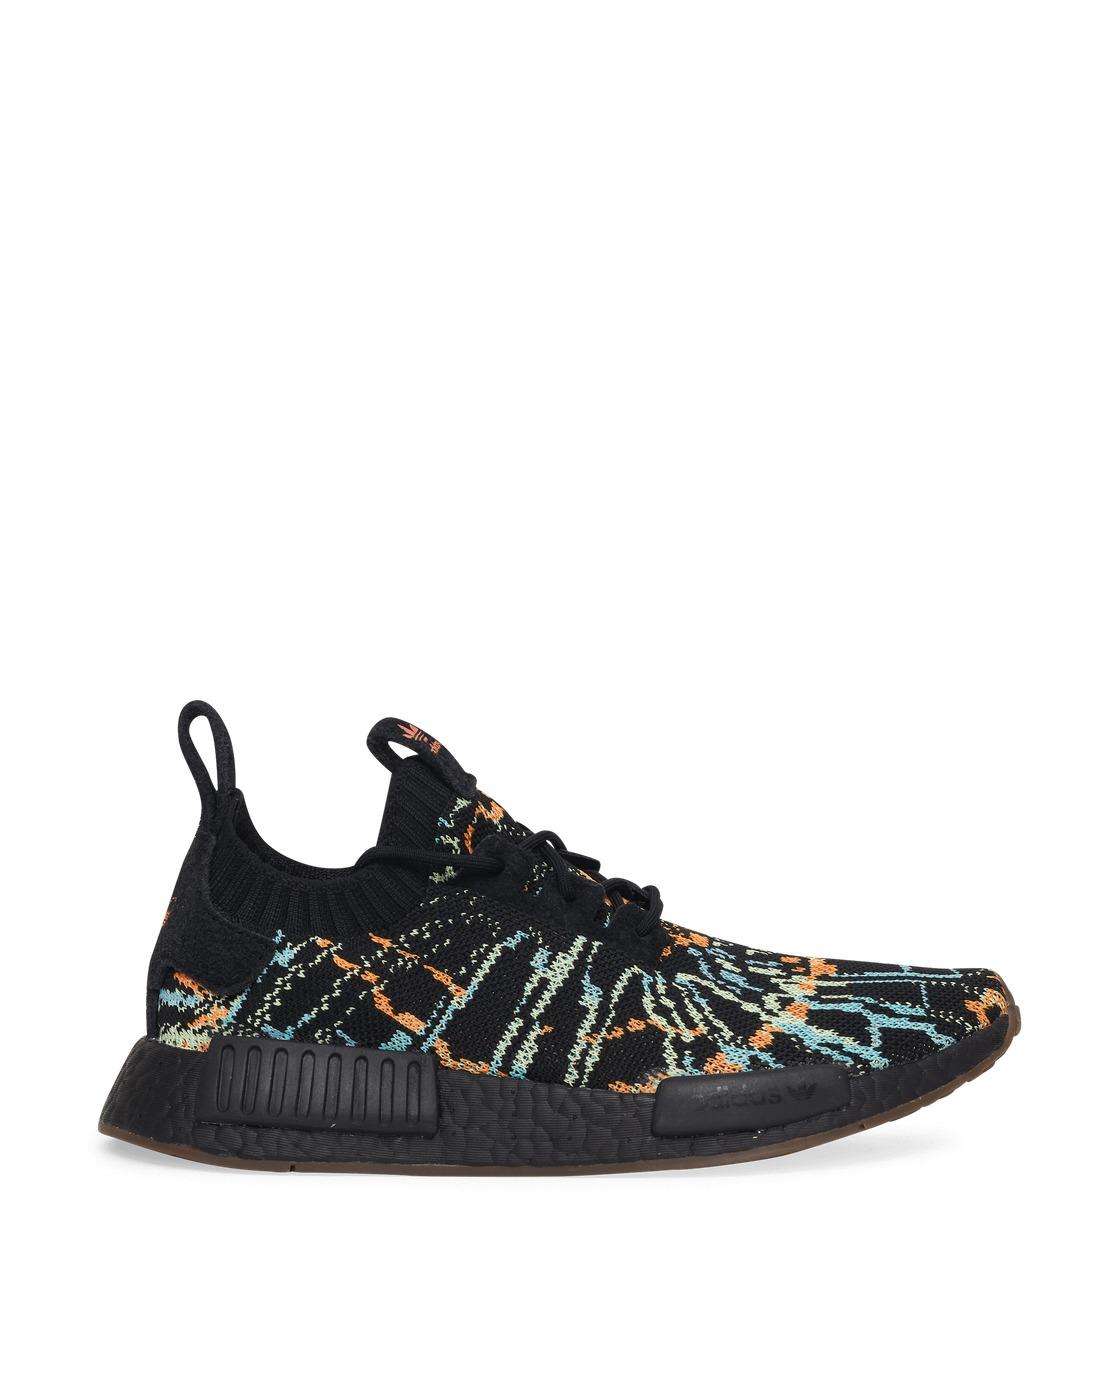 Adidas Originals Nmd R1 Pk Sneakers Core Black/Core Black